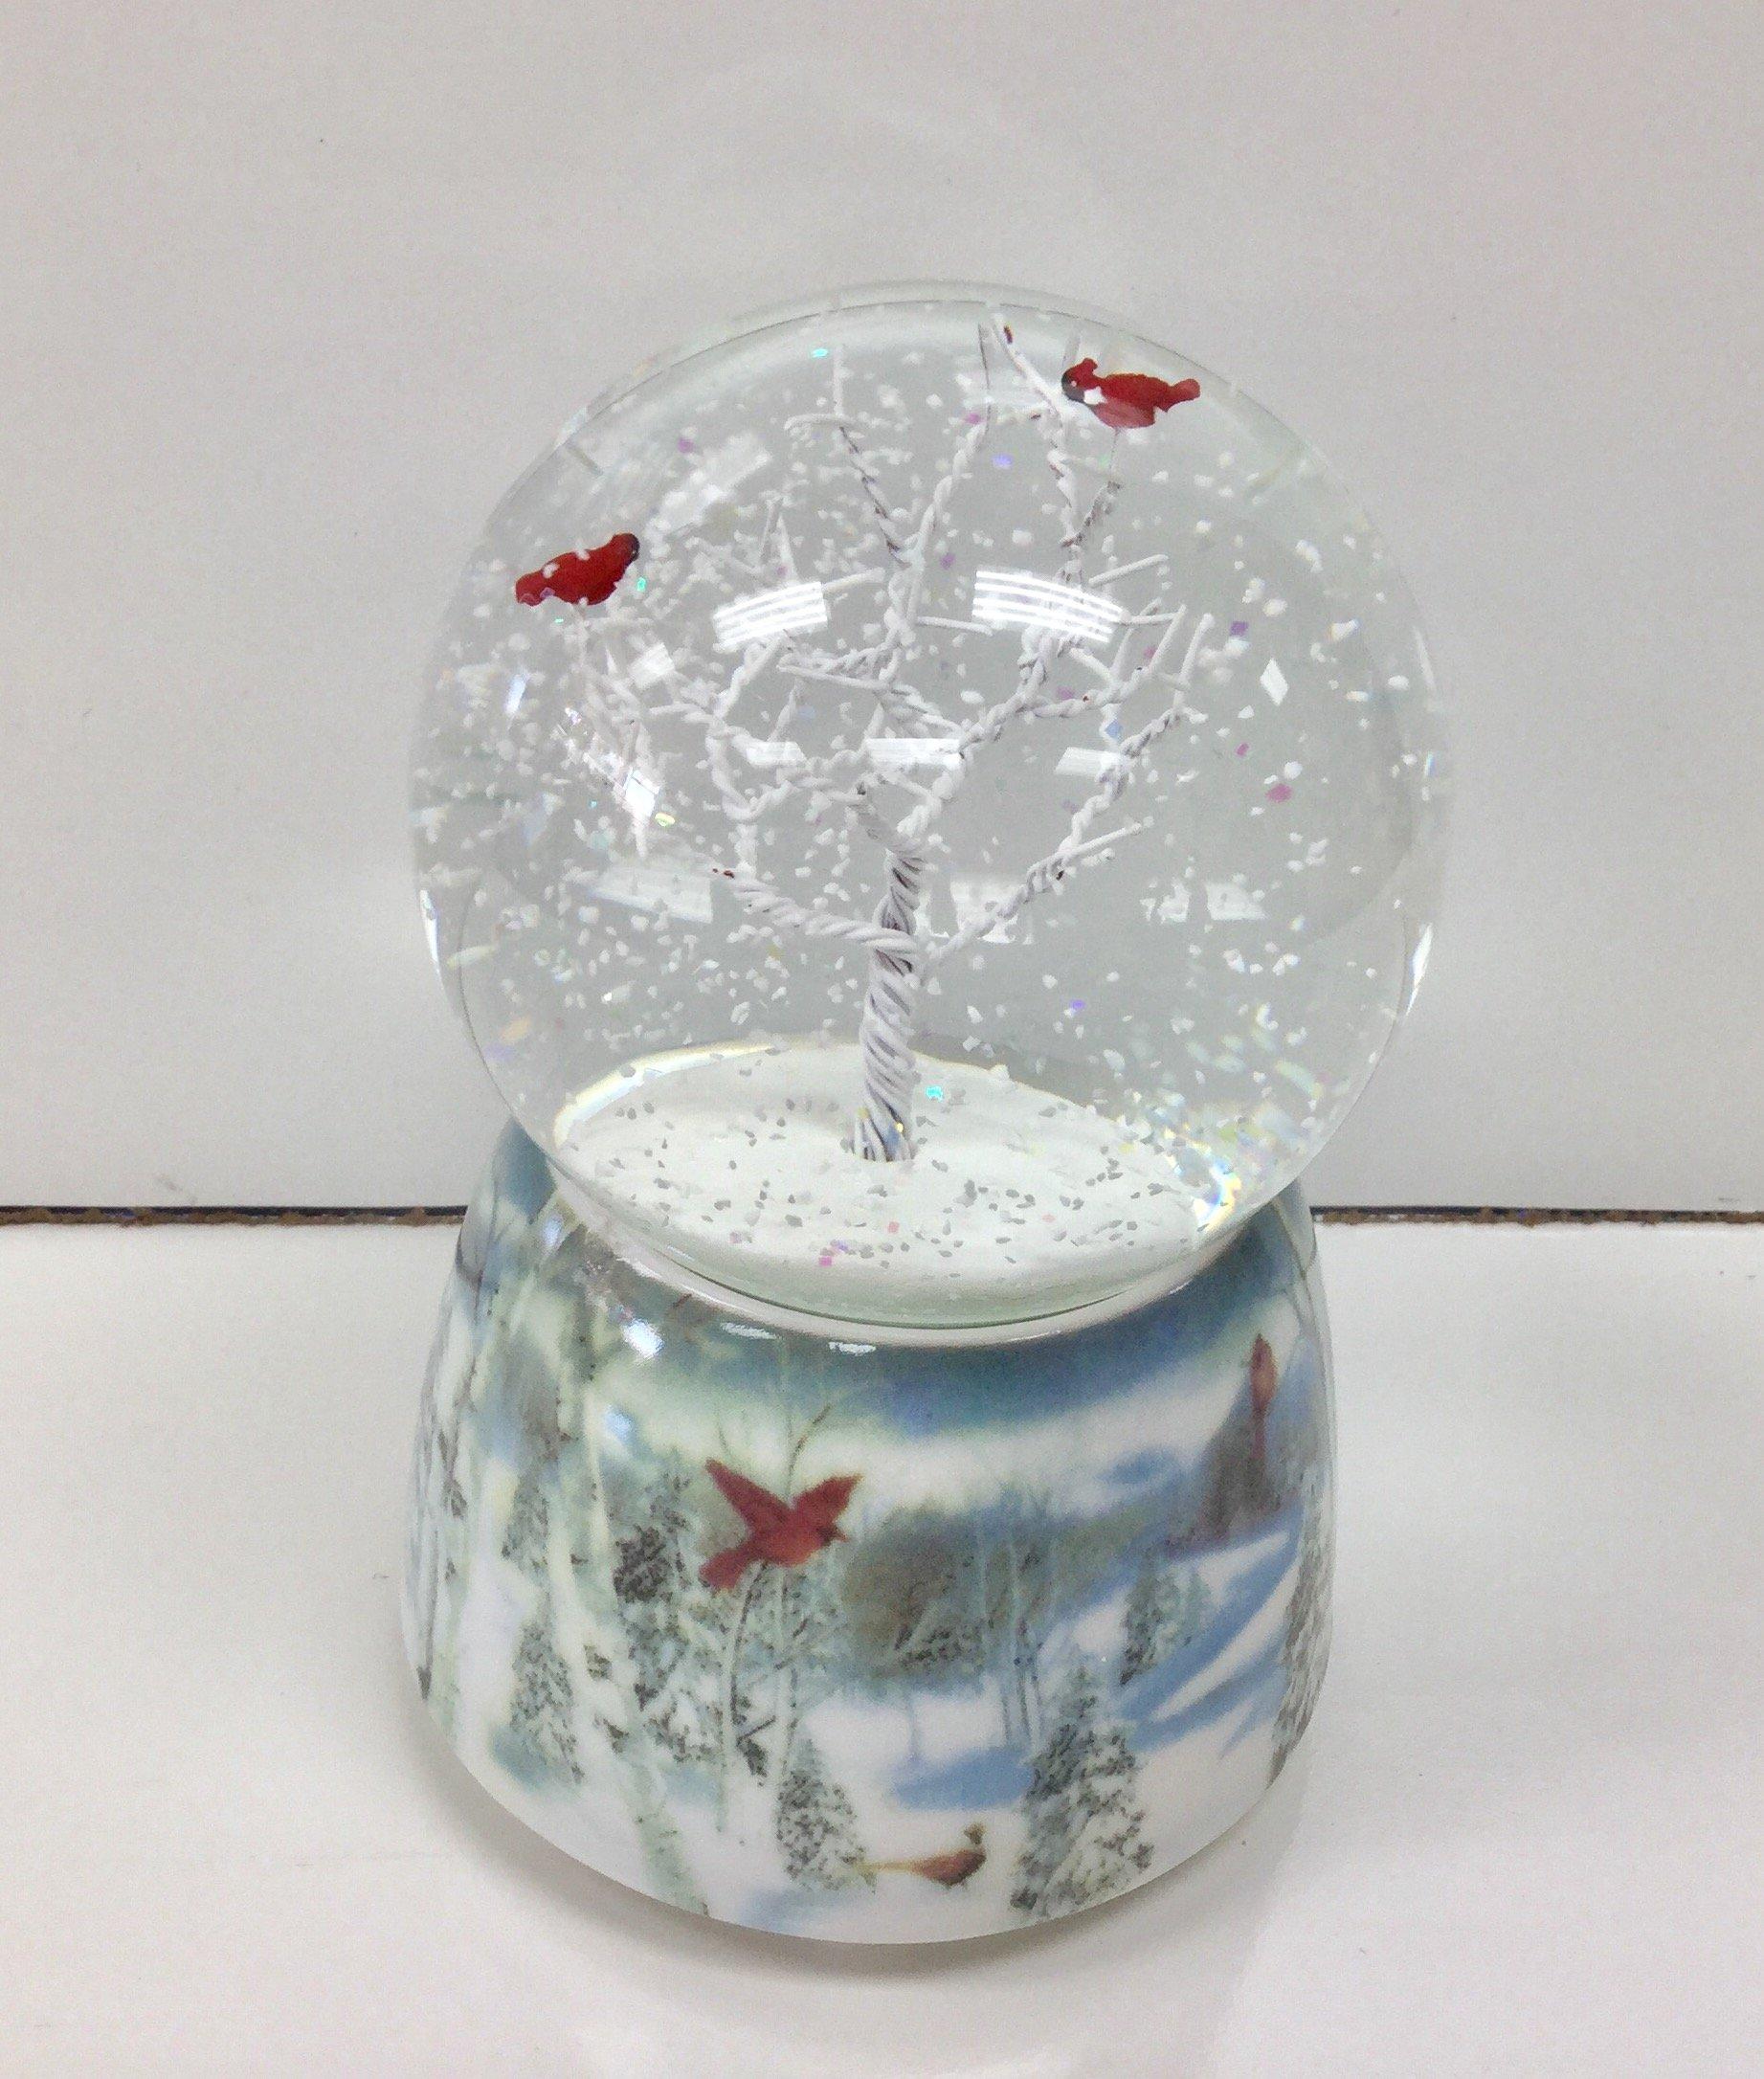 Winter Cardinals 75MM Musical Snow Globe Glitterdome by Roman (Image #2)